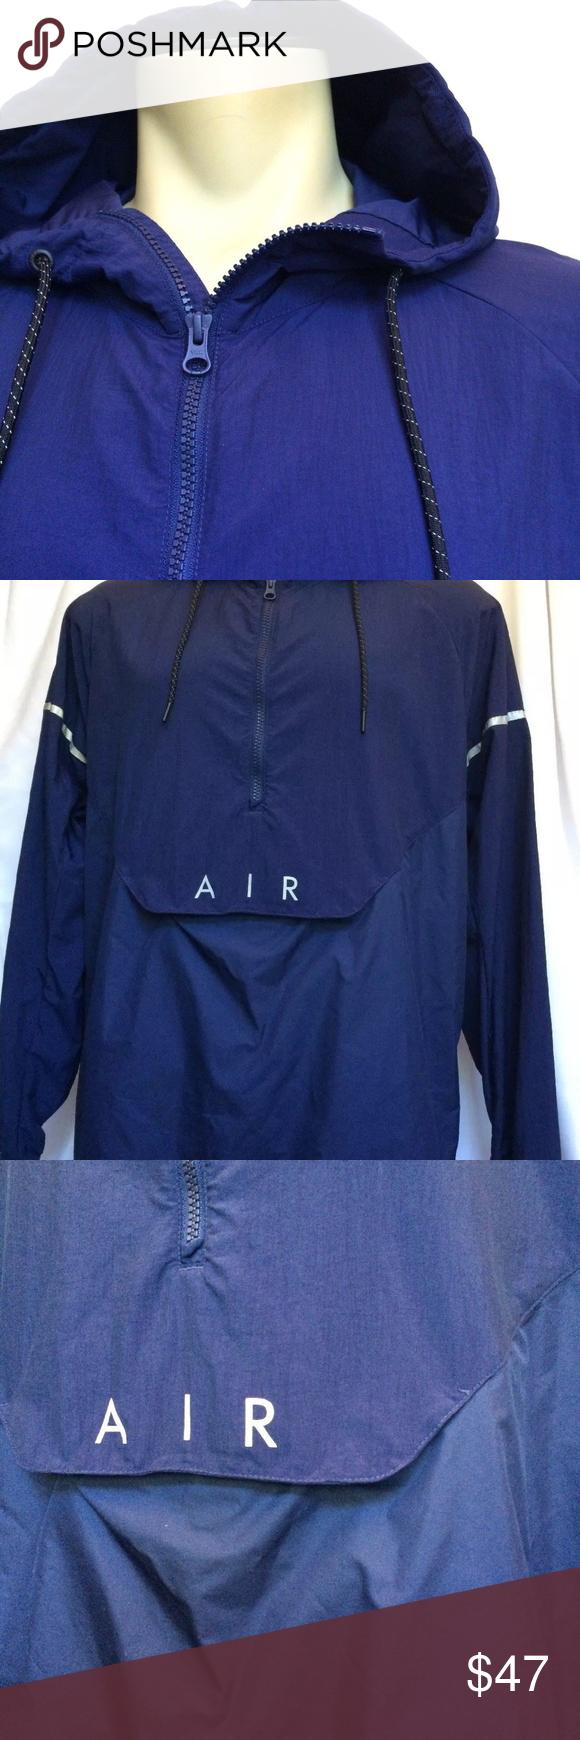 nike air max 97 pullover